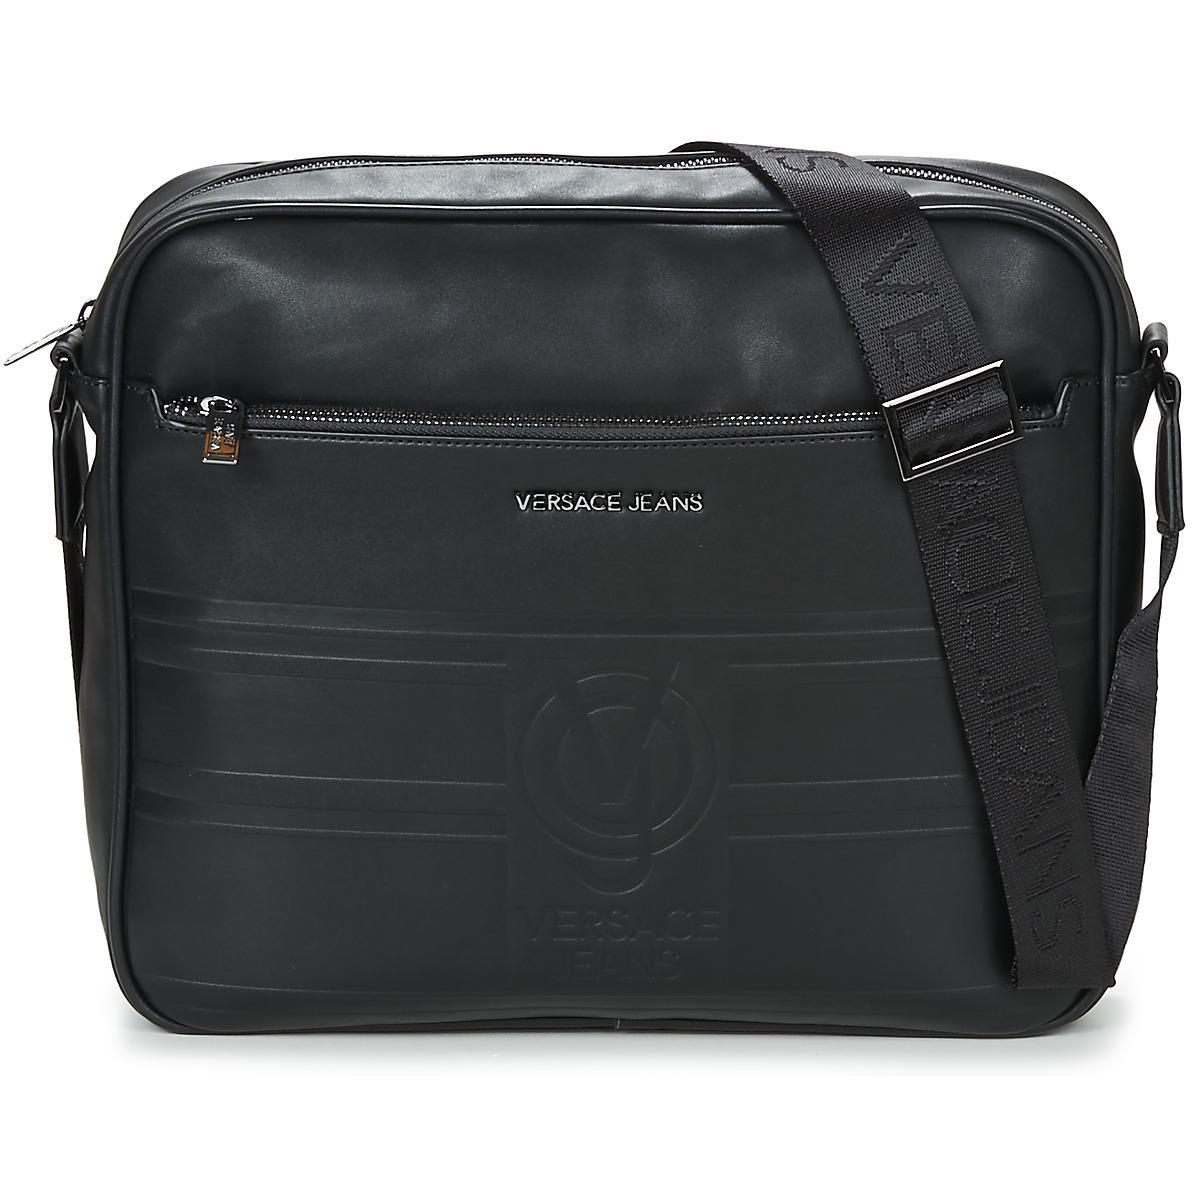 da811a2517 Versace Jeans Eloue Men s Messenger Bag In Black in Black for Men - Lyst